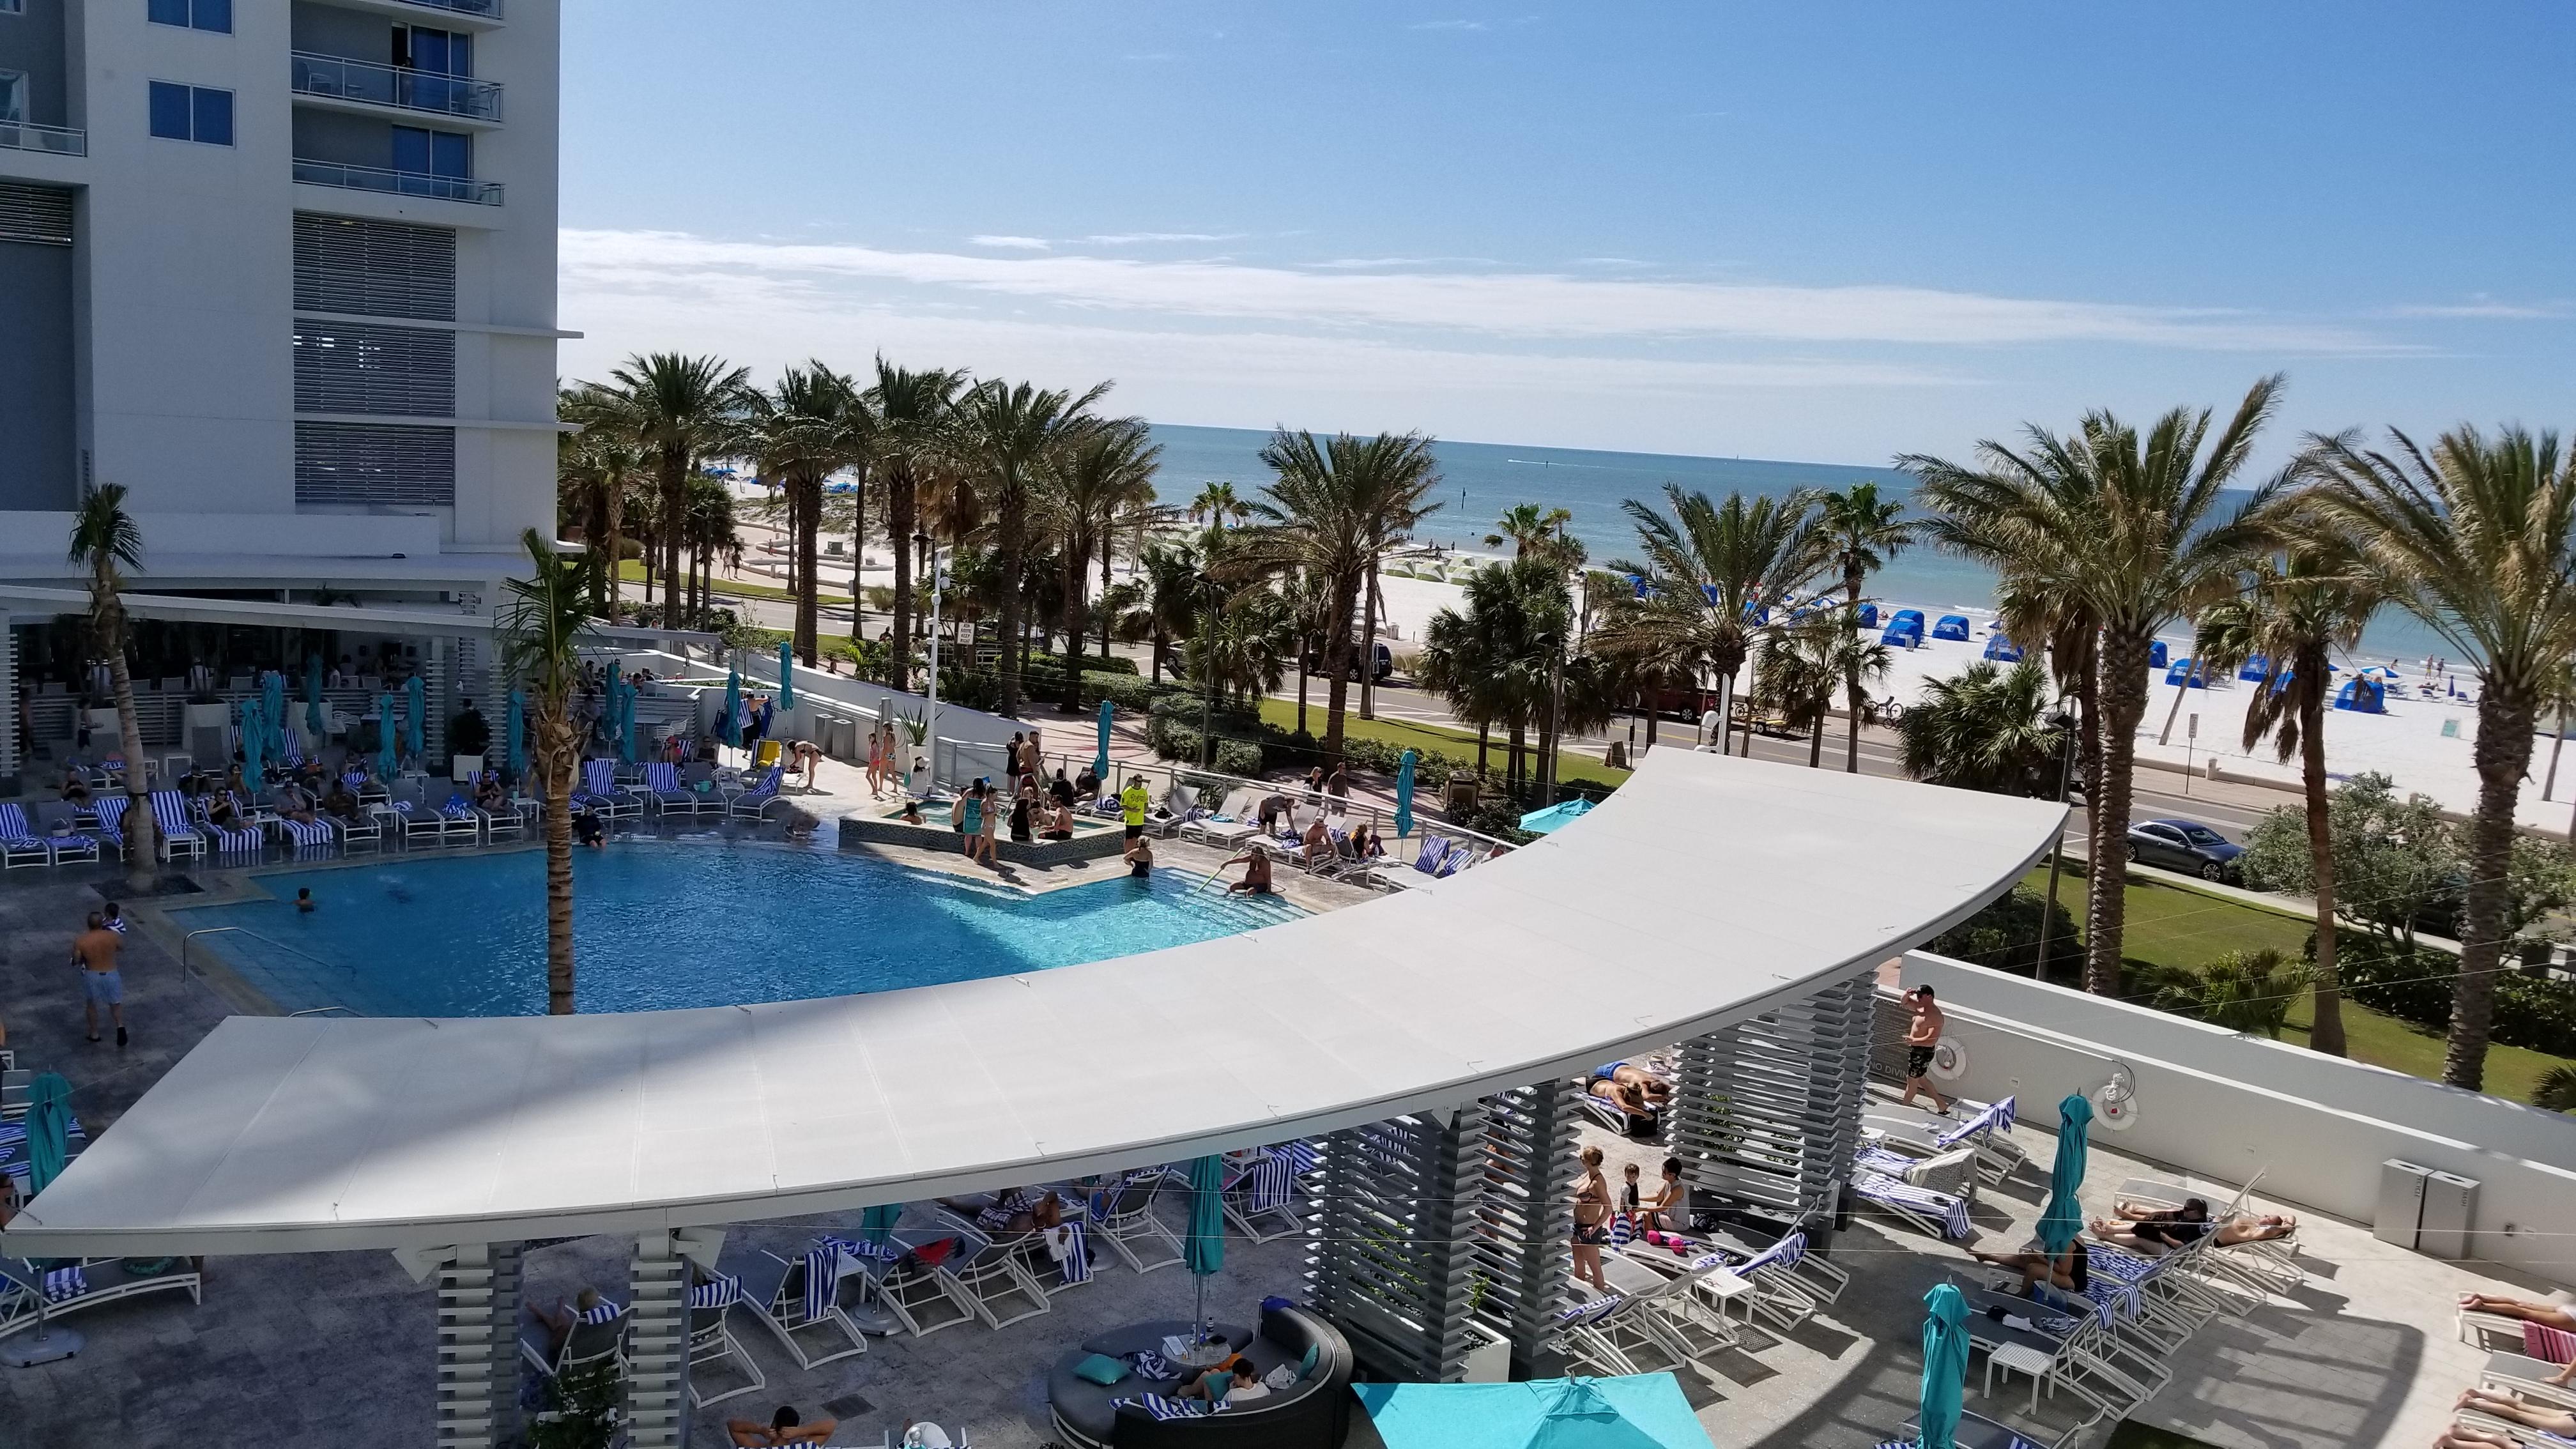 Apartment Clearwater Beach Resort 2 Bedrooms 2 bathrooms photo 20363968